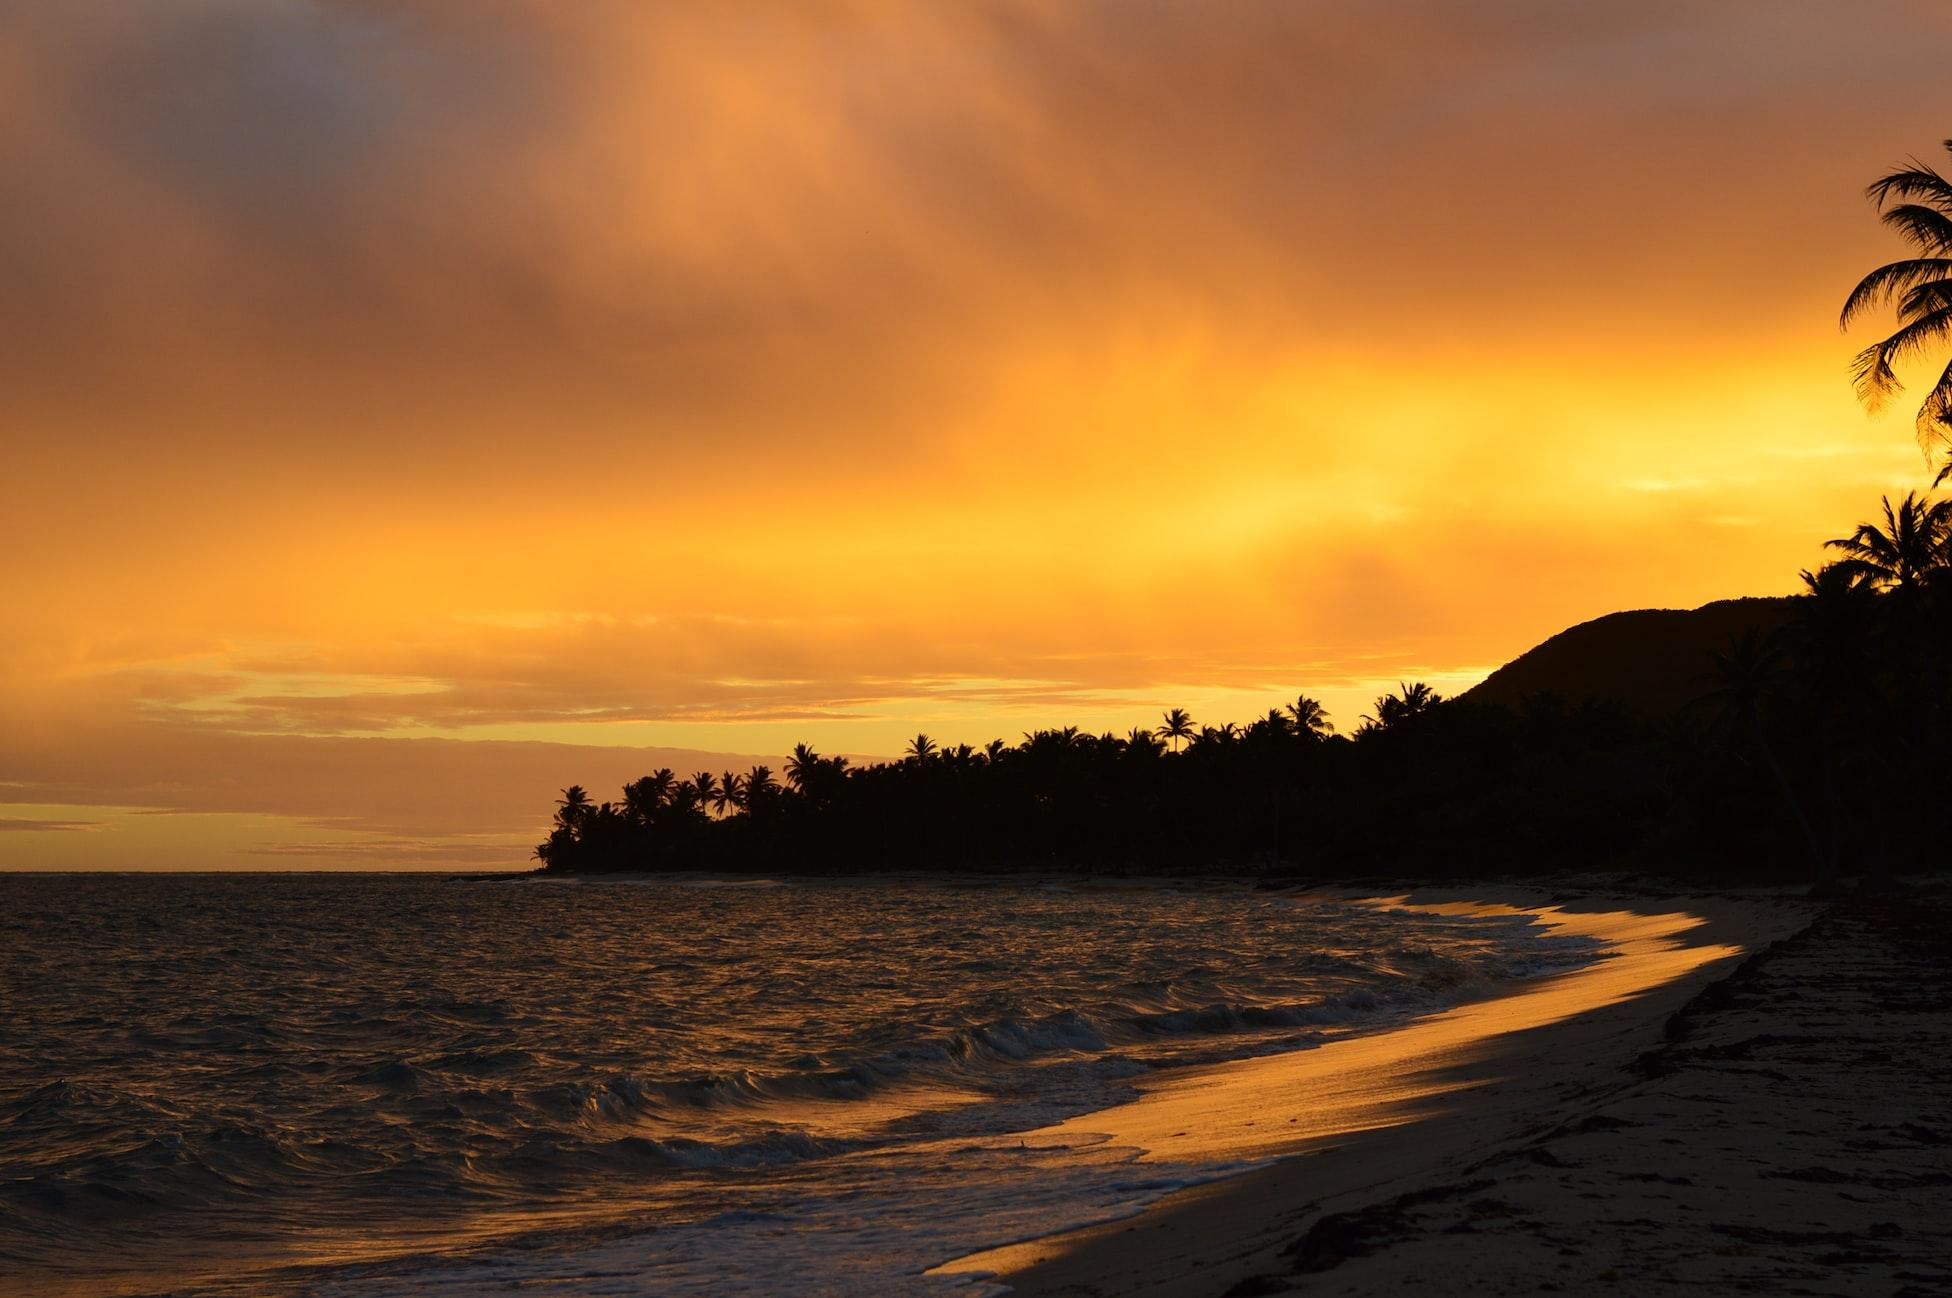 atardecer en playa paradisiaca en Guadalupe